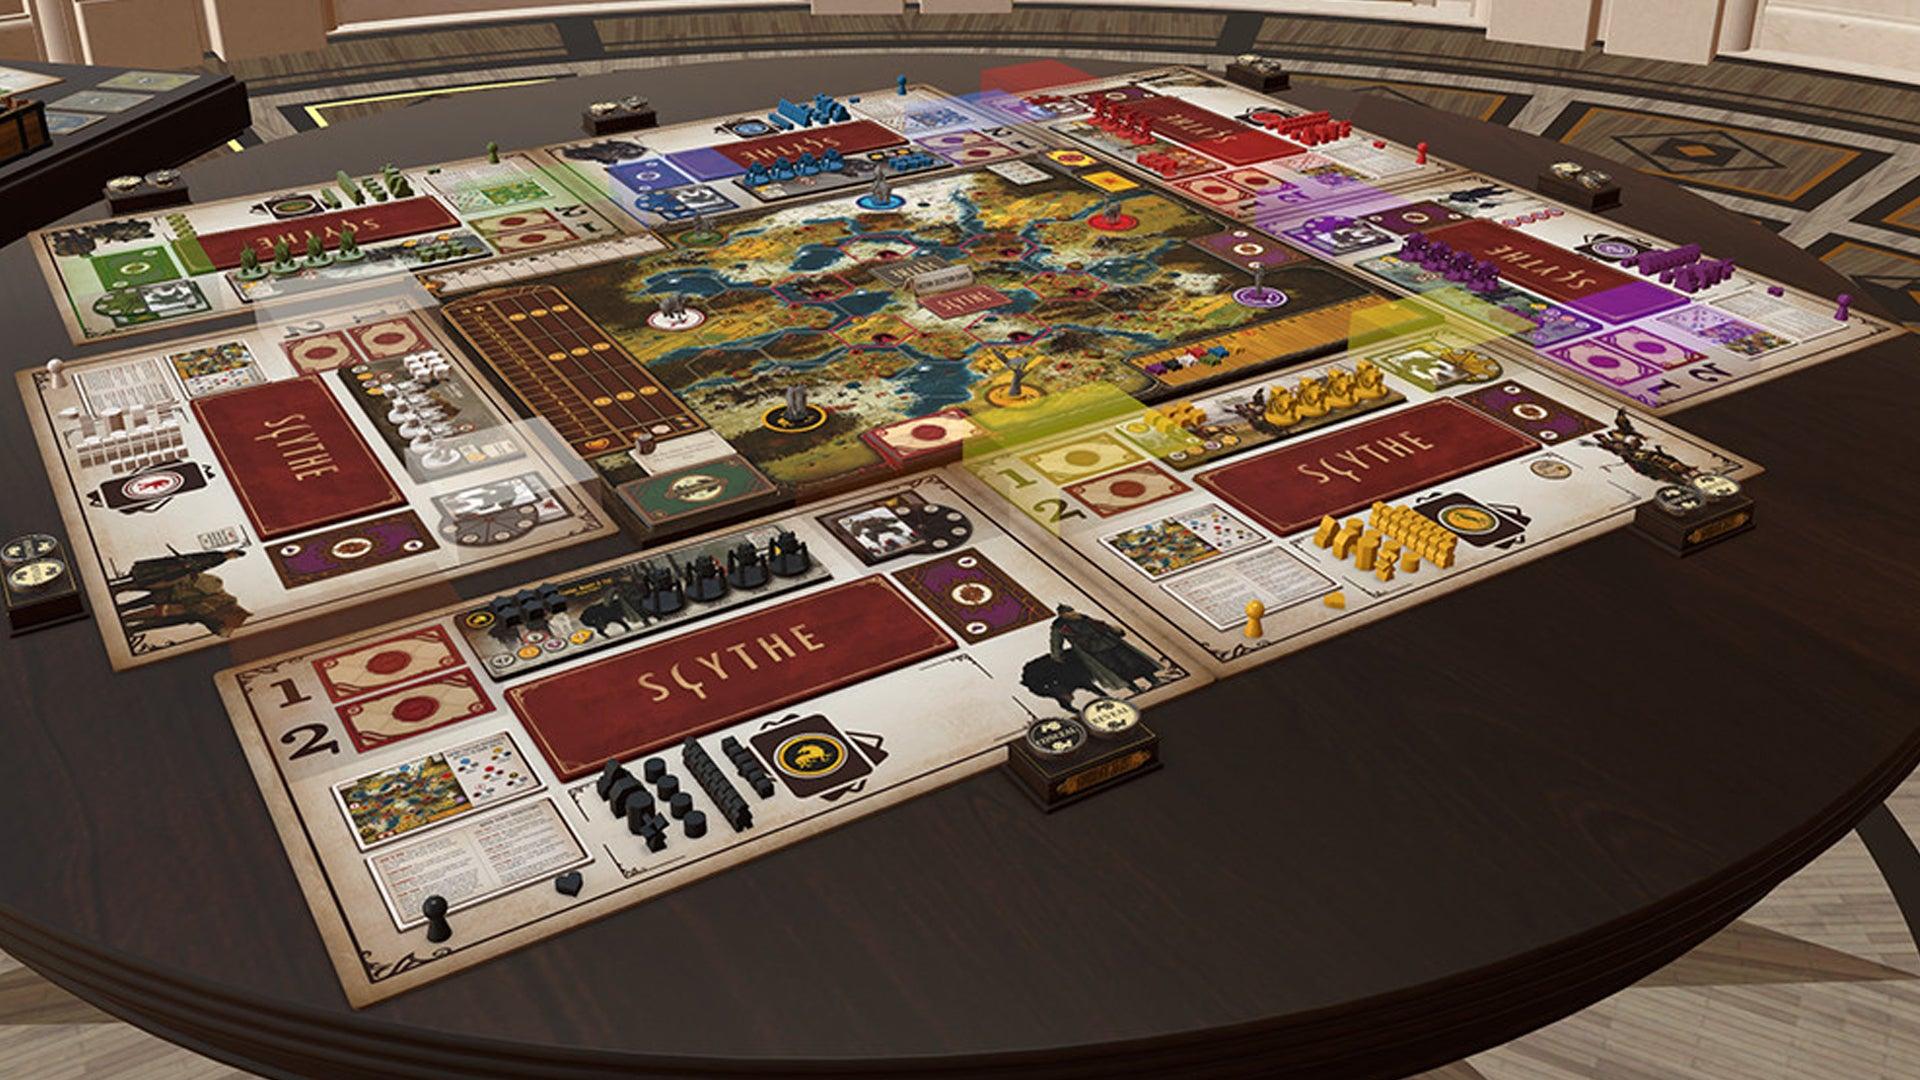 scythe-tabletop-simulator-online-board-game-layout.jpg